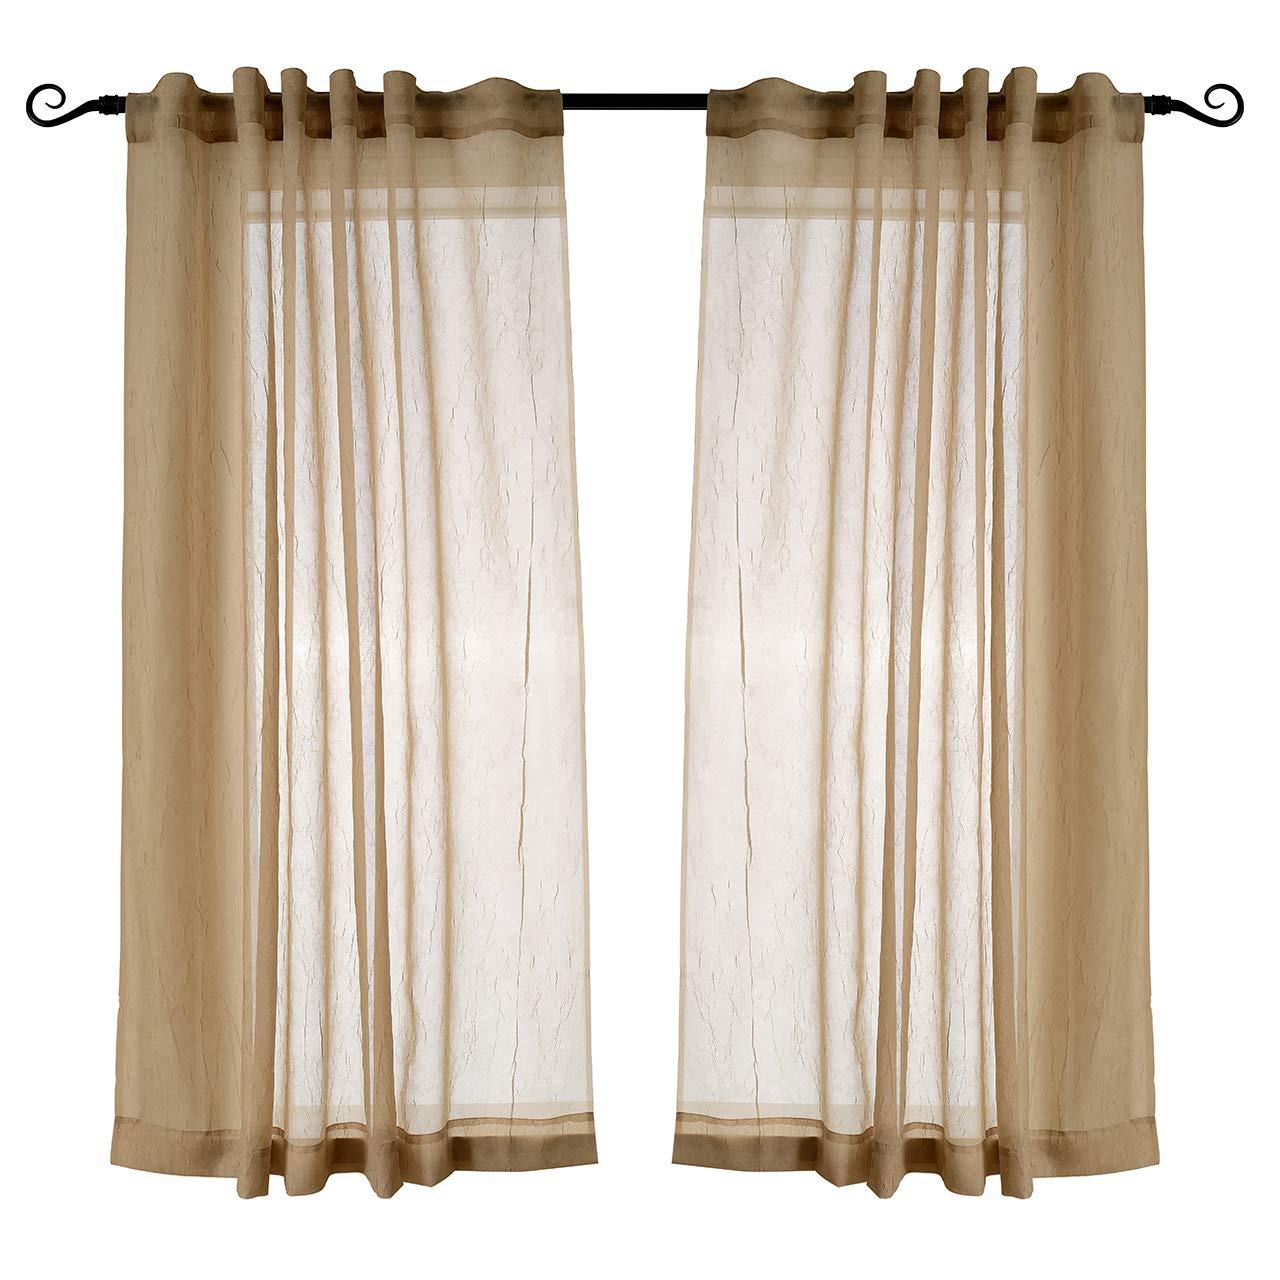 MYSKY HOME Semi Sheer Curtains 63 Inch Length for Bedroom Rod Pocket and Back Tap Crushed Design Sheer Curtain Panels for Living Room (Mocha, 51'' W x 63'' L, Set of 2 Crinkle Sheer Drapes)